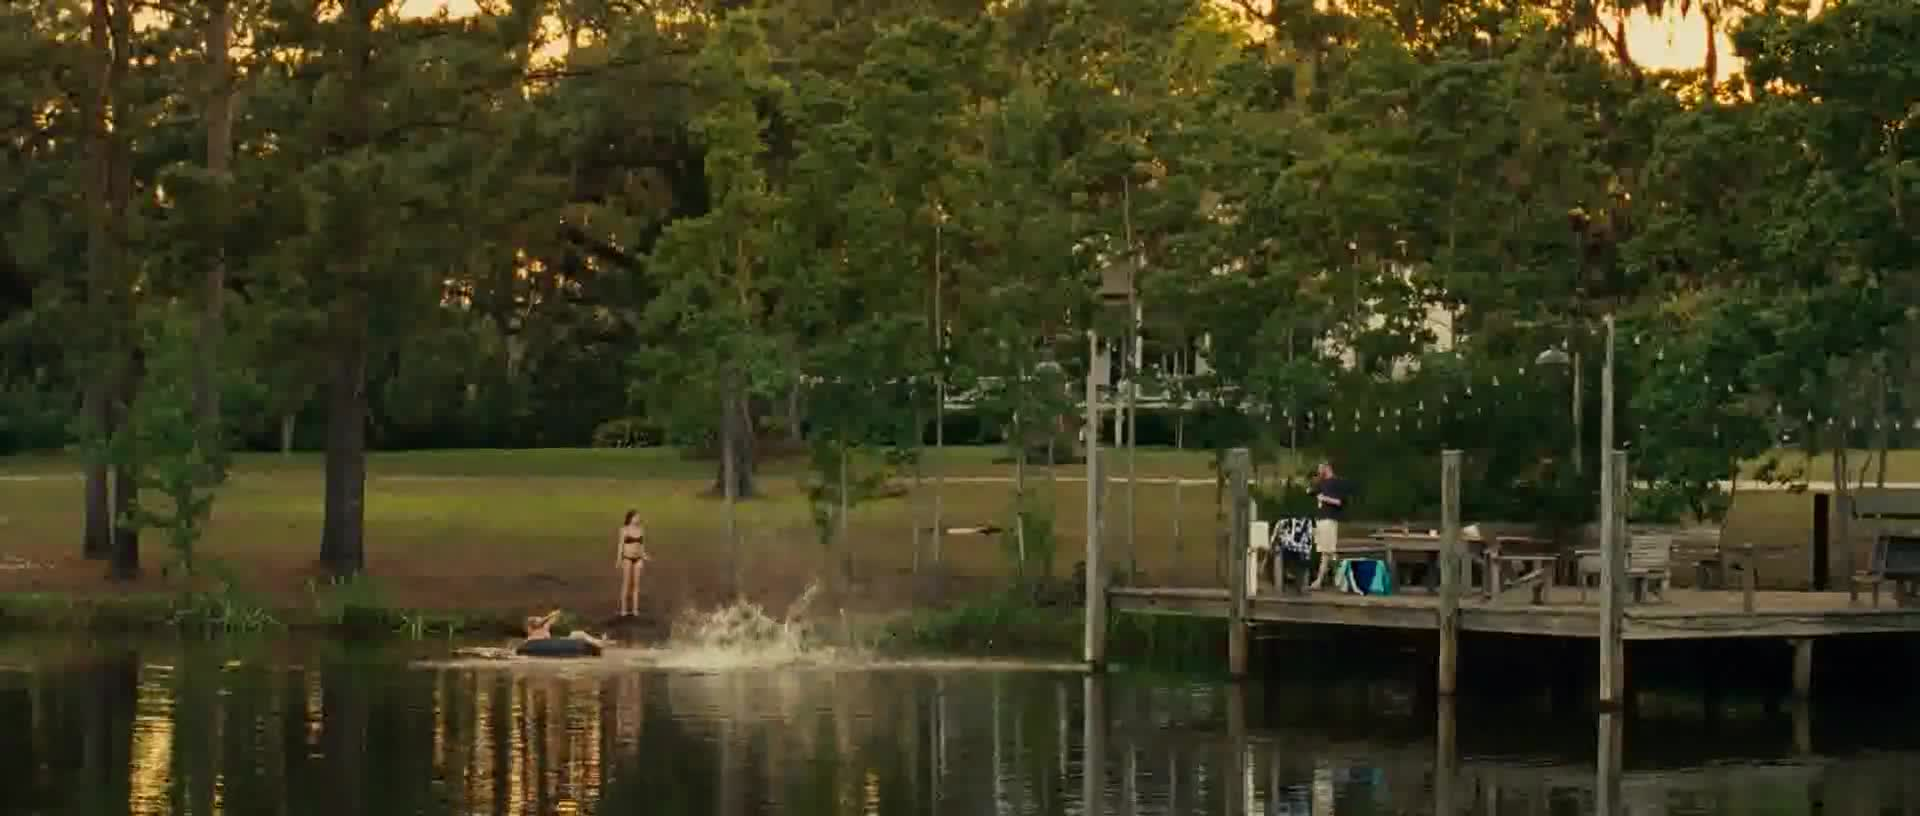 Amanda Seyfried scene - Solstice